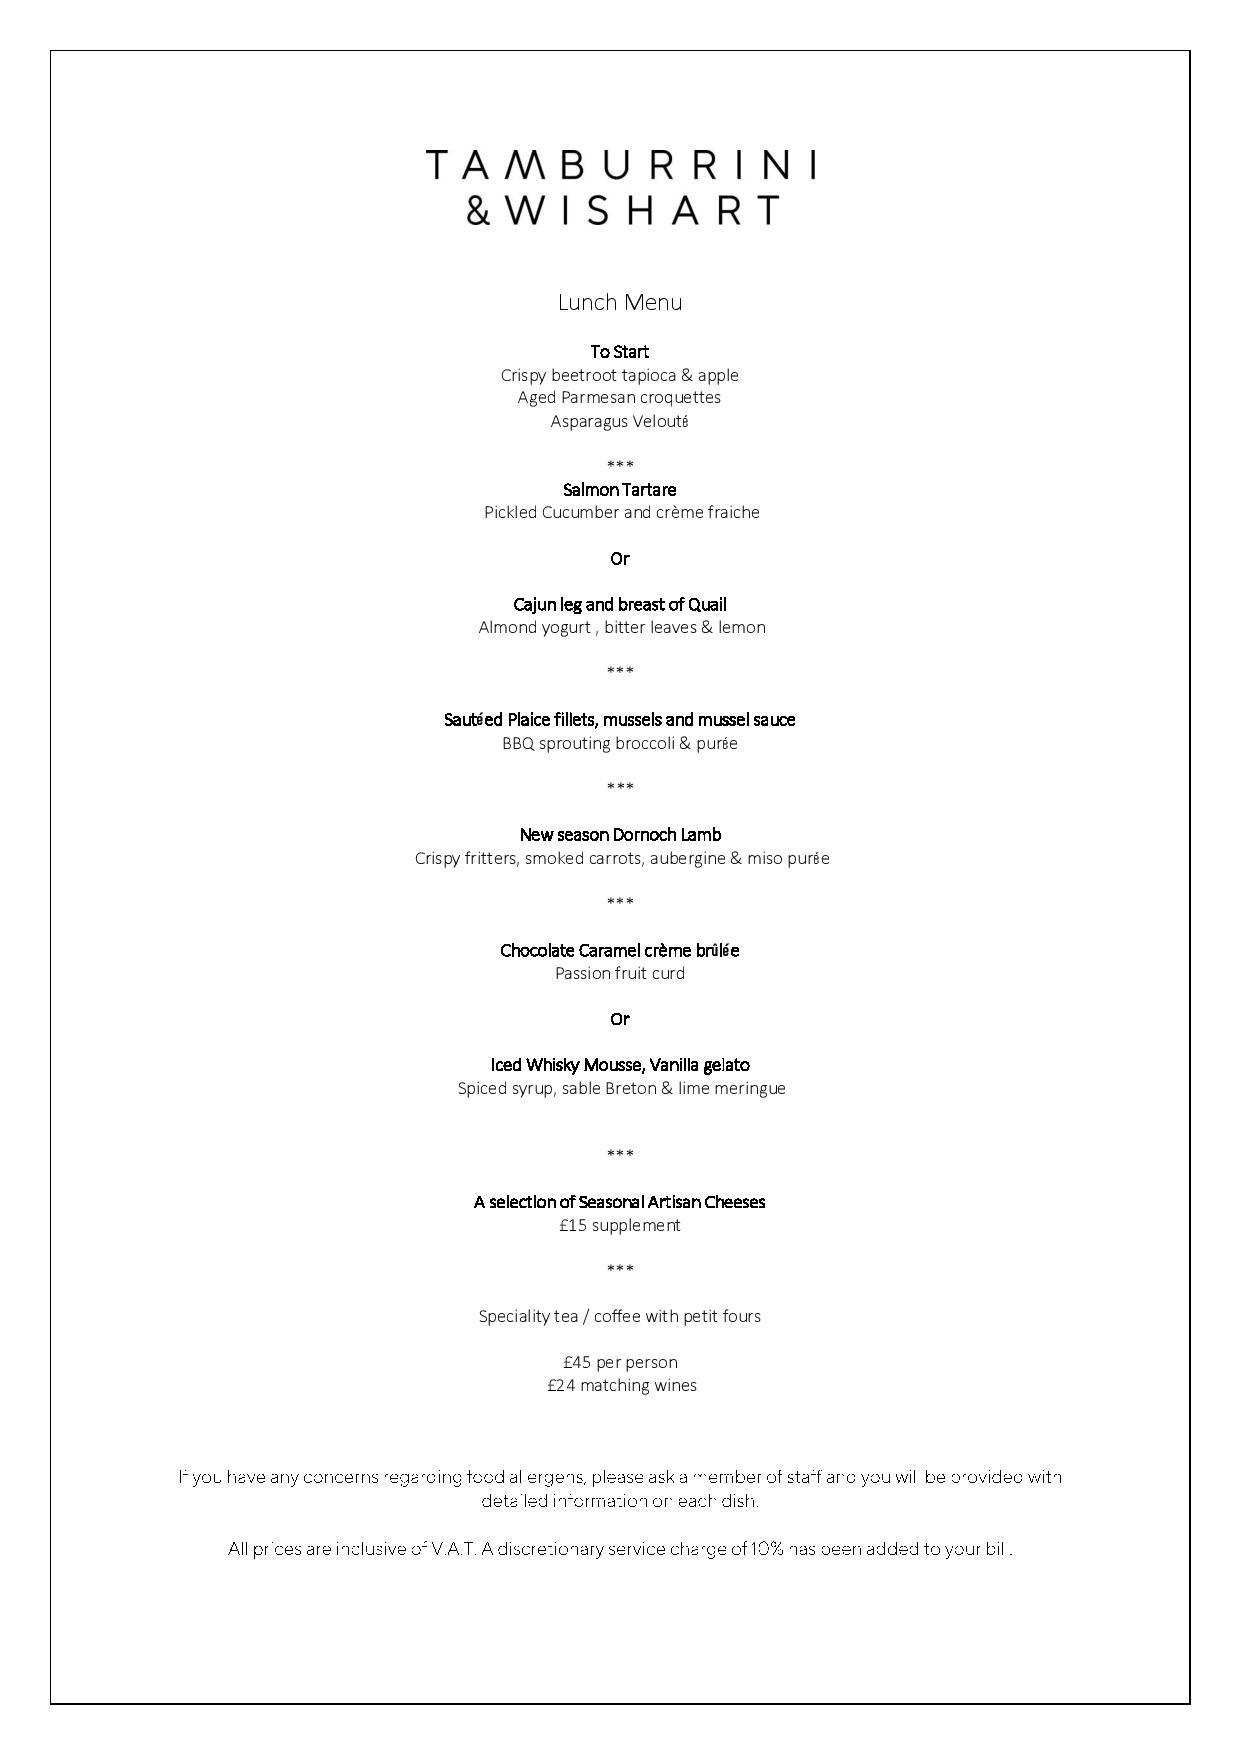 Tamburrini and Wishart lunch menu